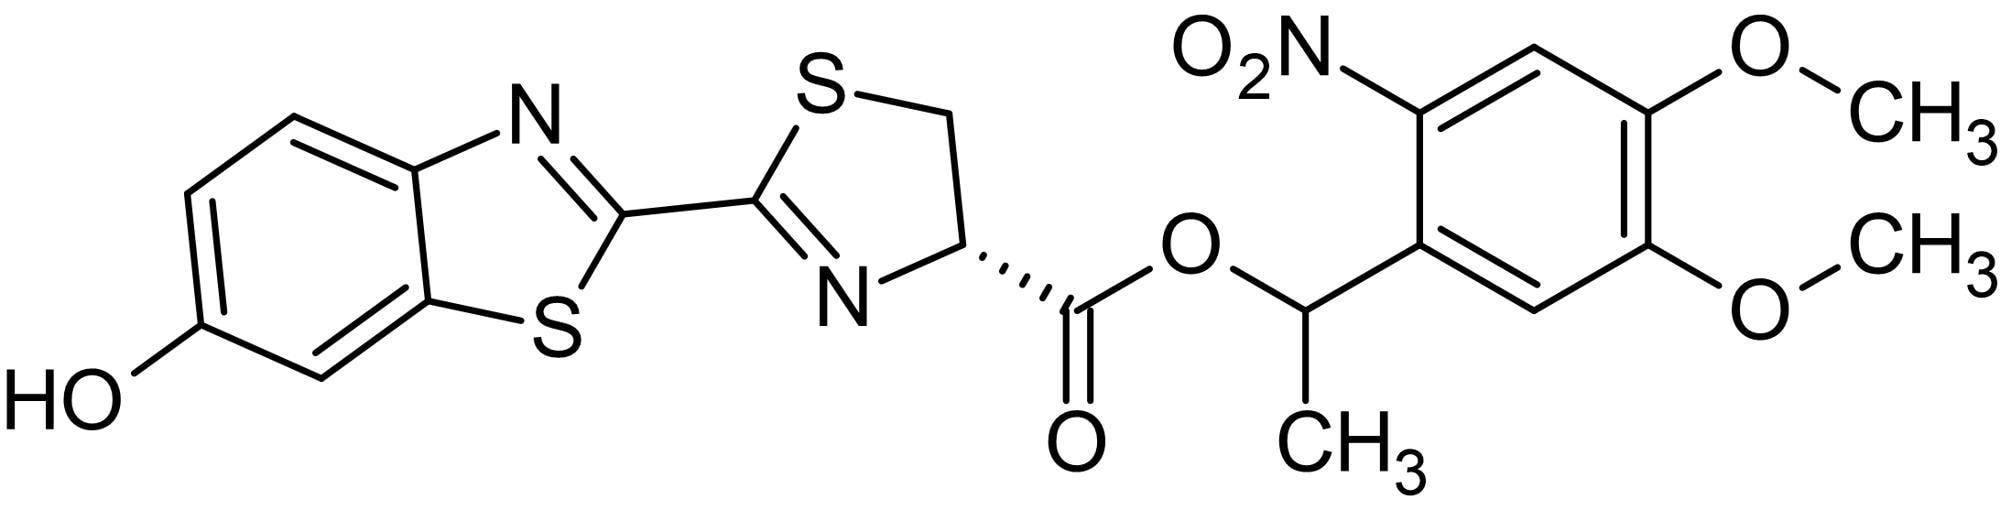 Chemical Structure - DMNPE-caged Luciferin, D-Luciferin precursor (ab145163)